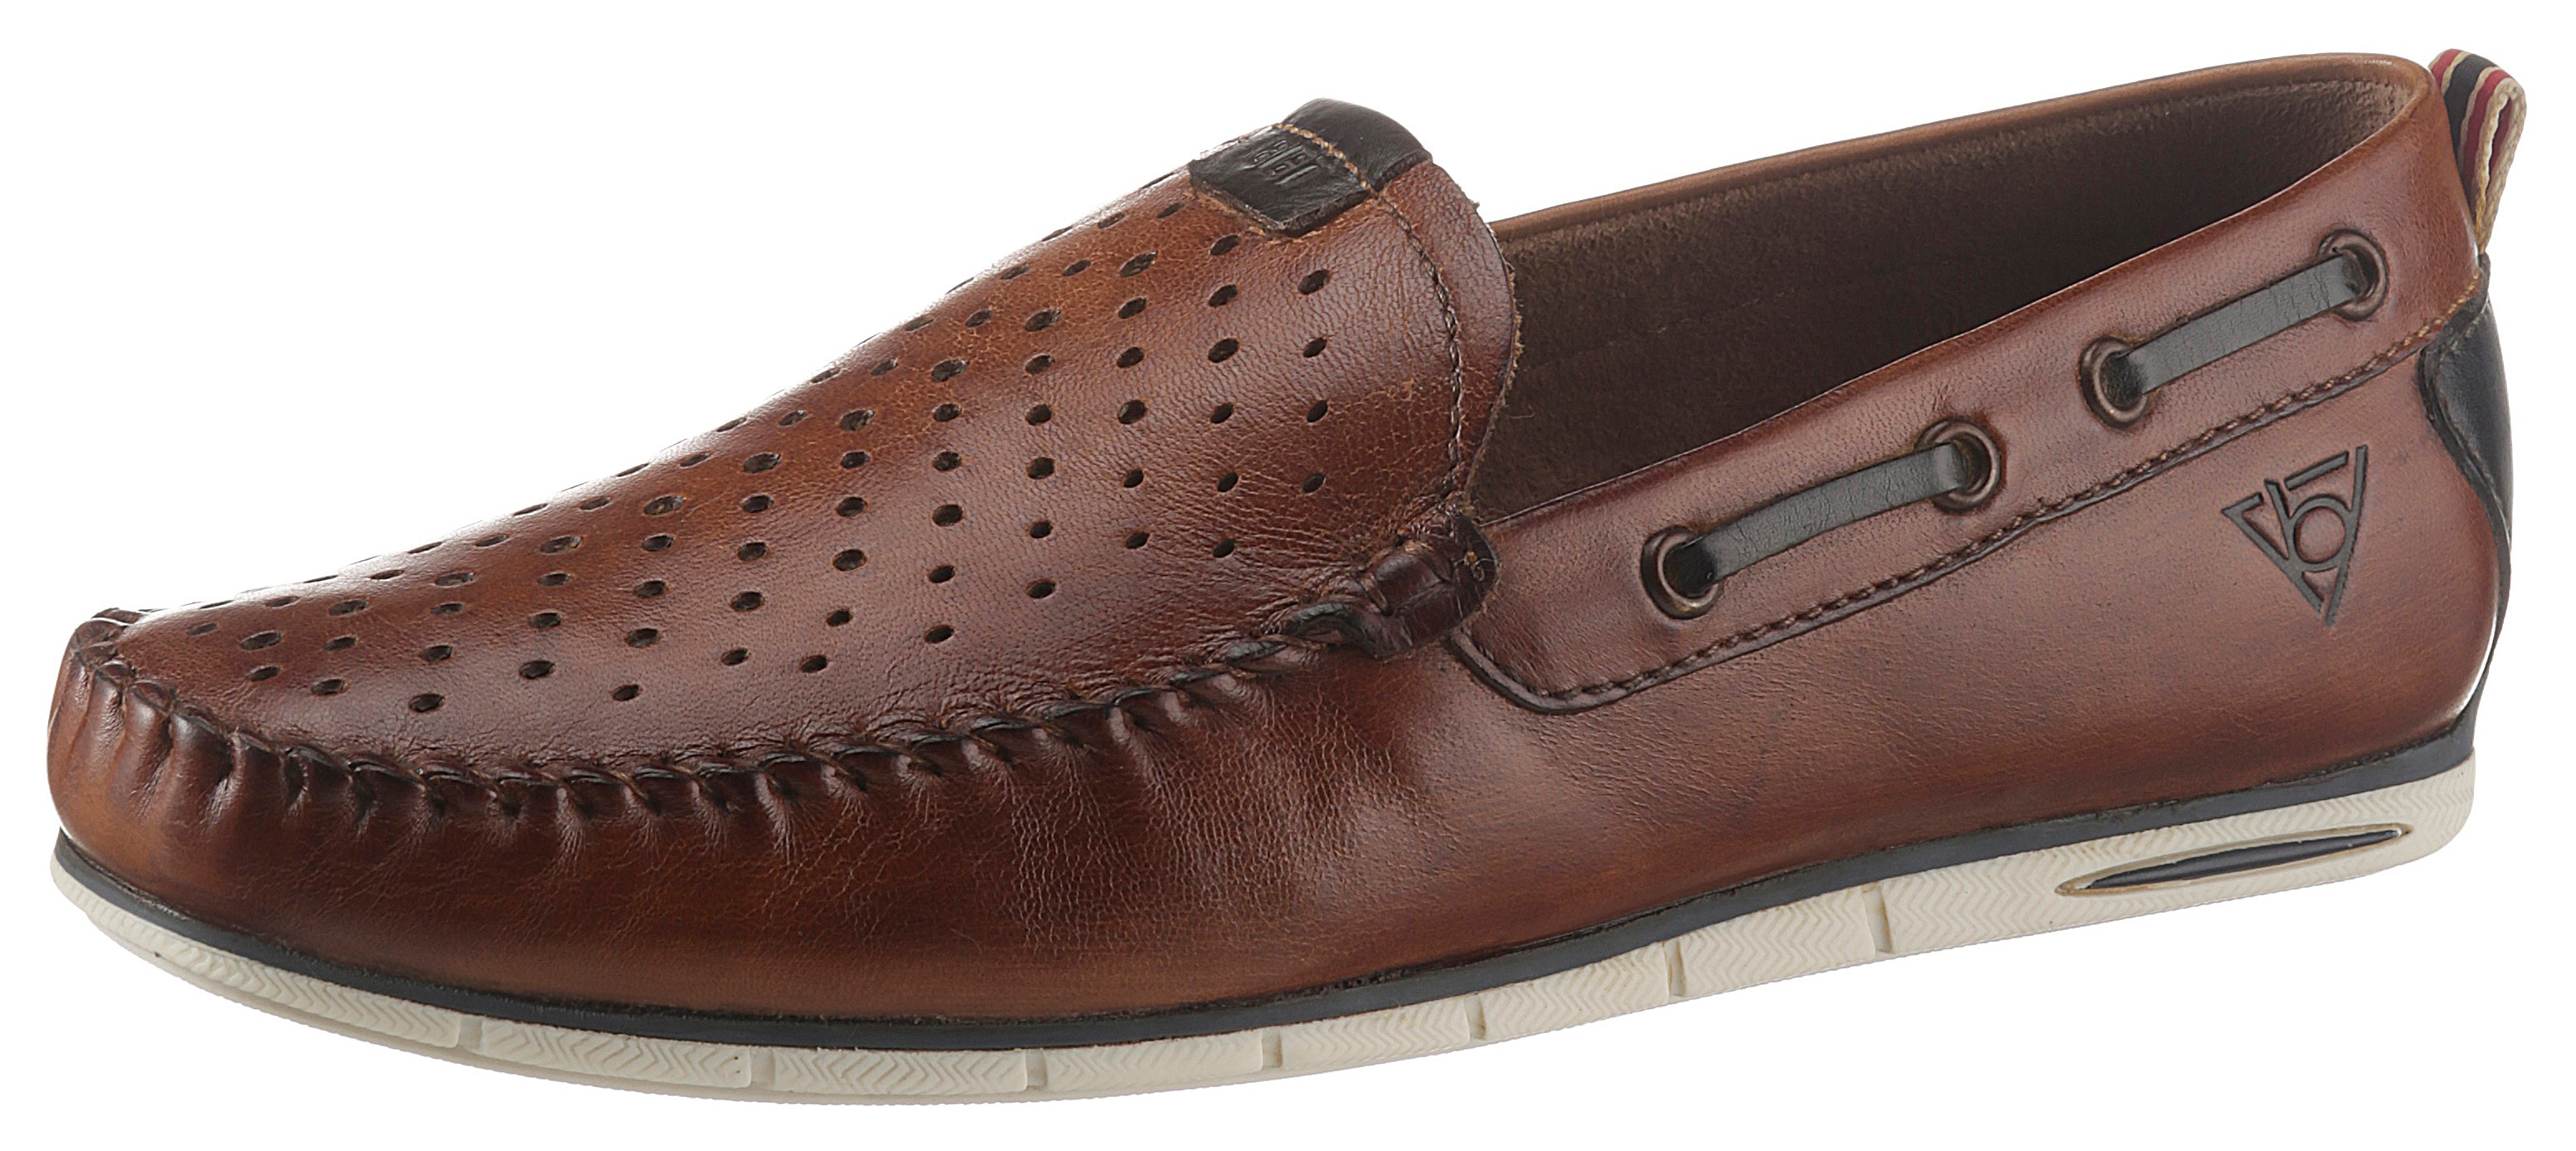 bugatti Slipper, in Mokassin-Optik braun Herren Slipper Sneaker